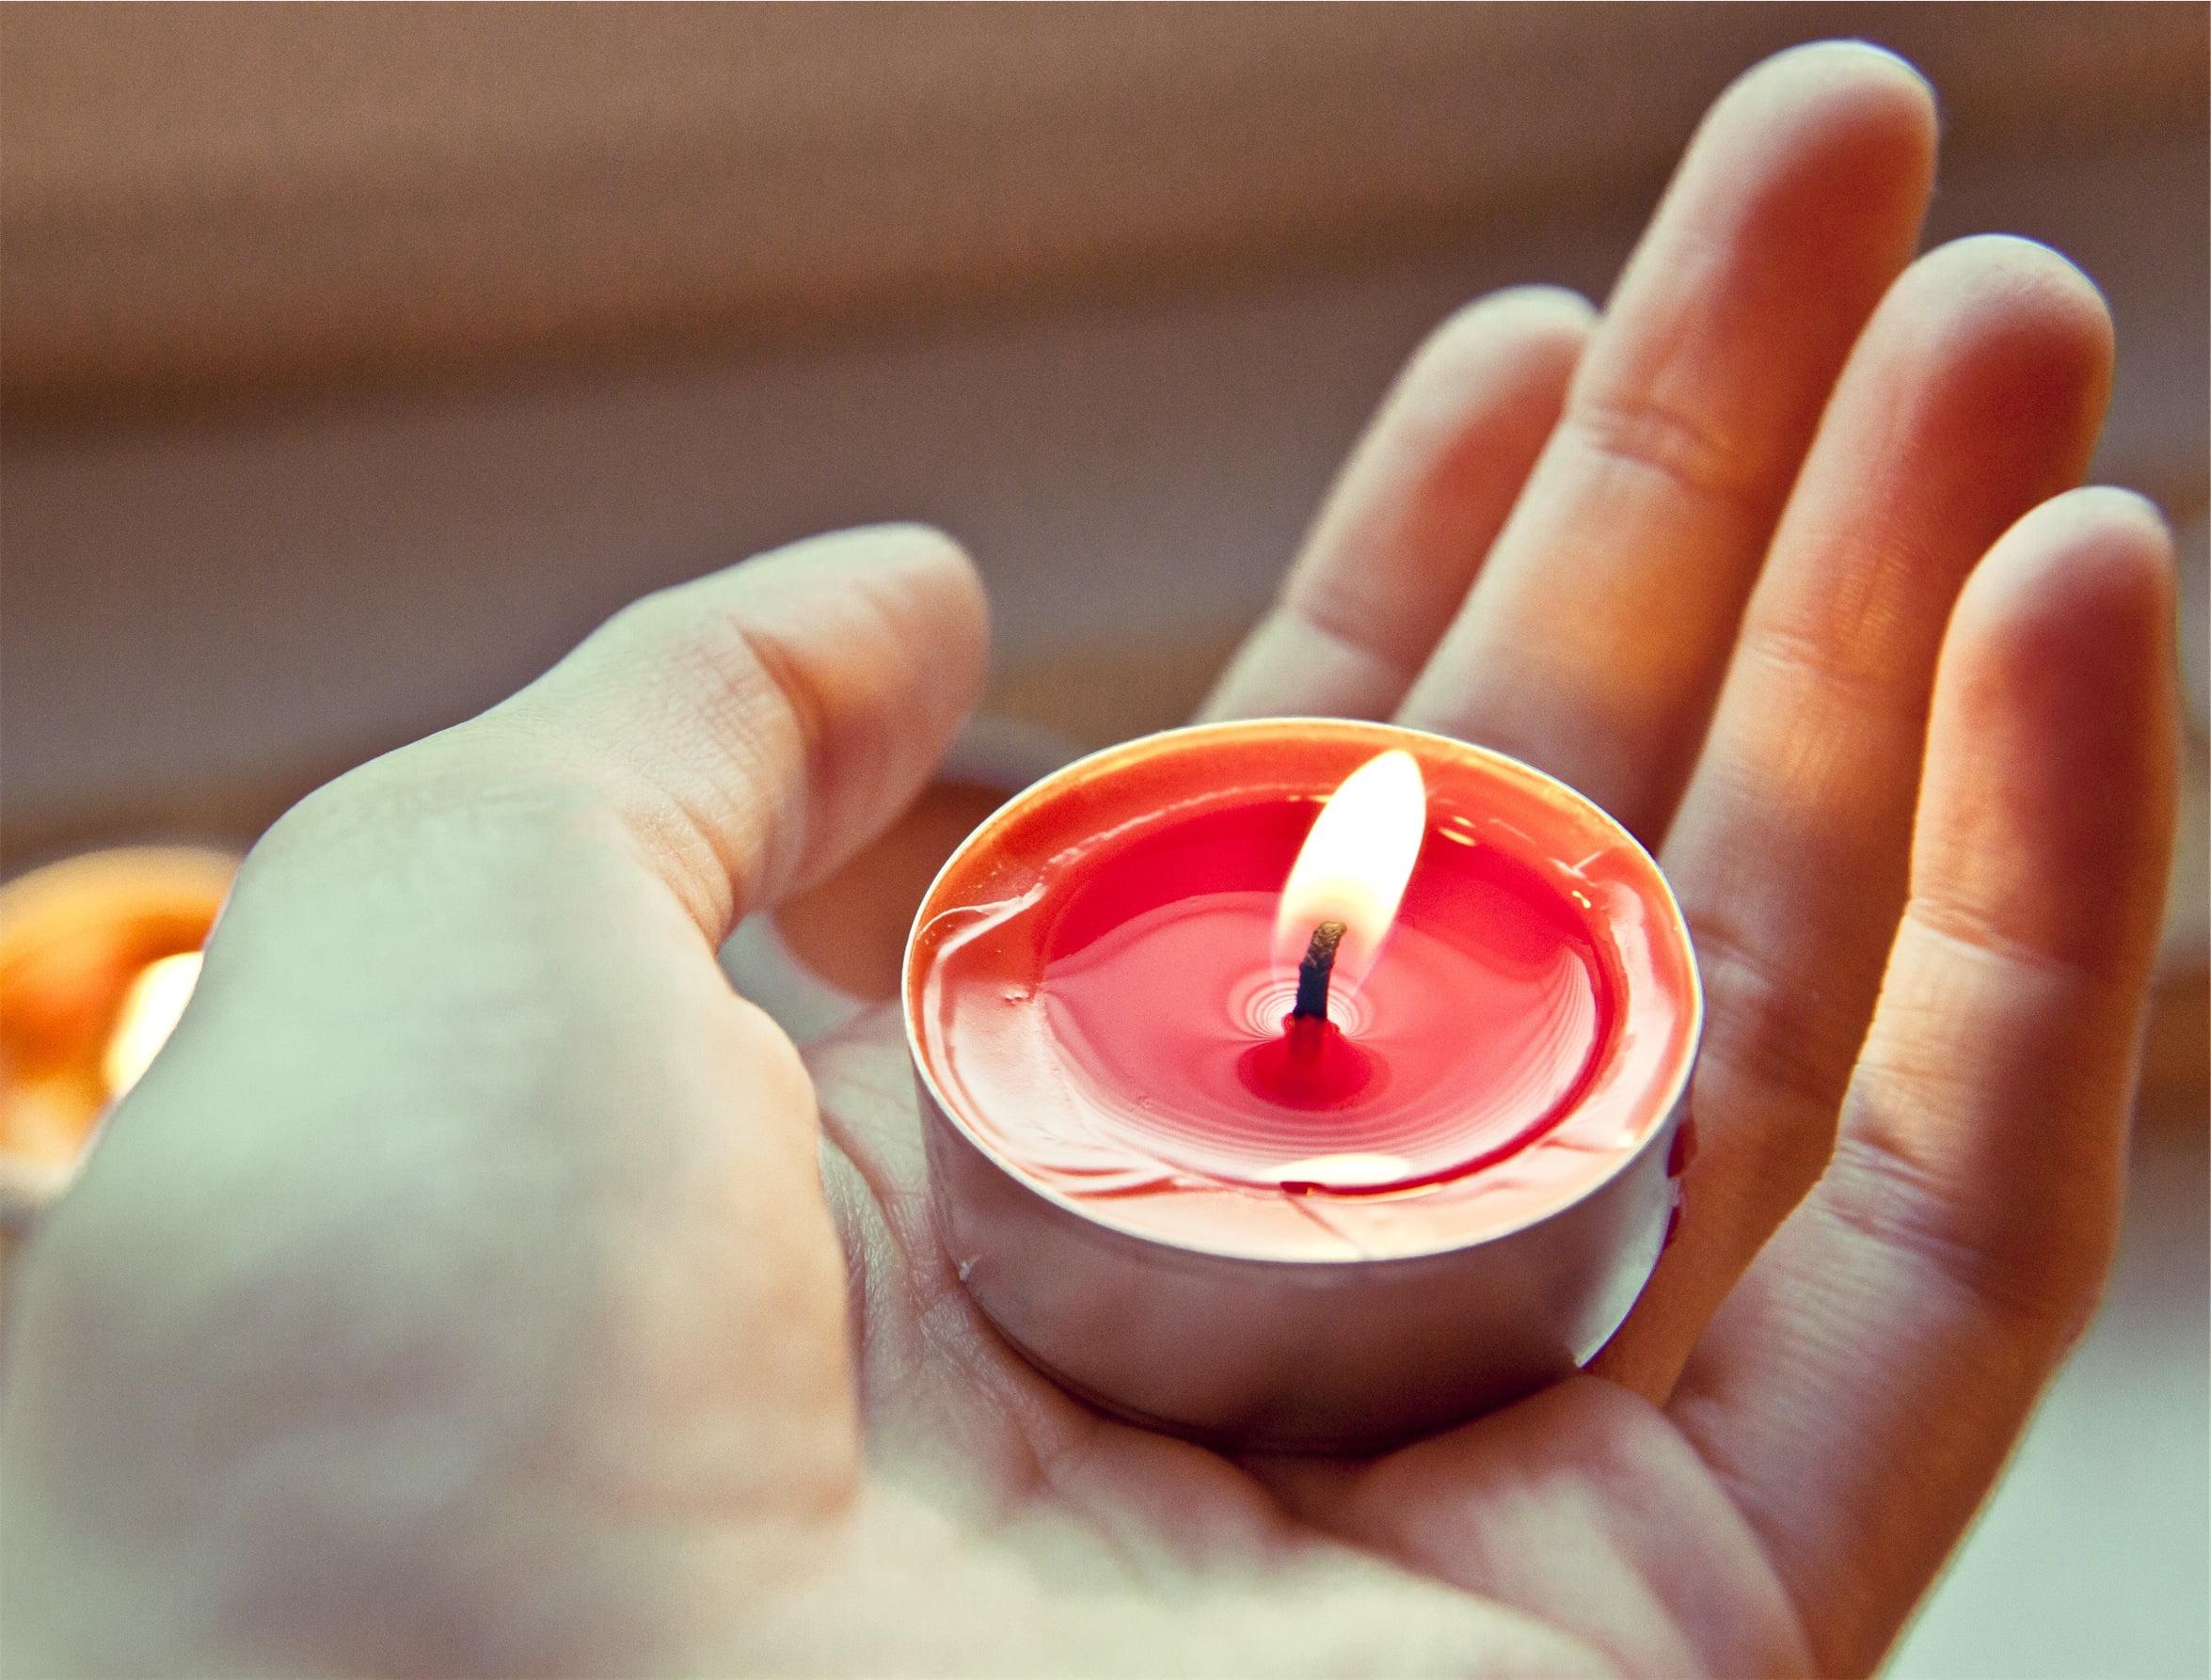 Tangan menjaga lilin, foto Milada Vigerova